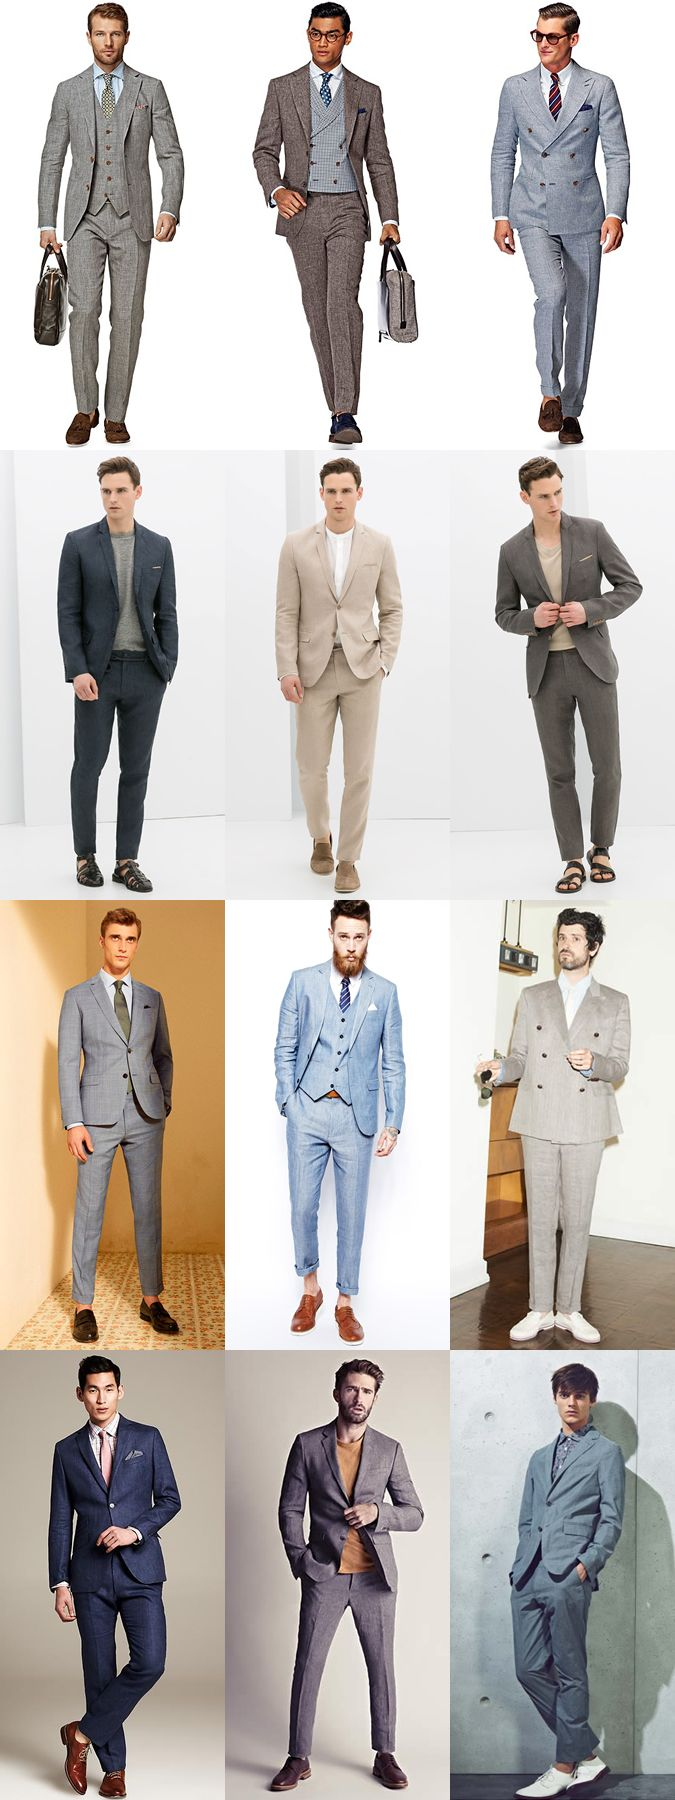 High Summer Style: The Linen Suit Lookbook